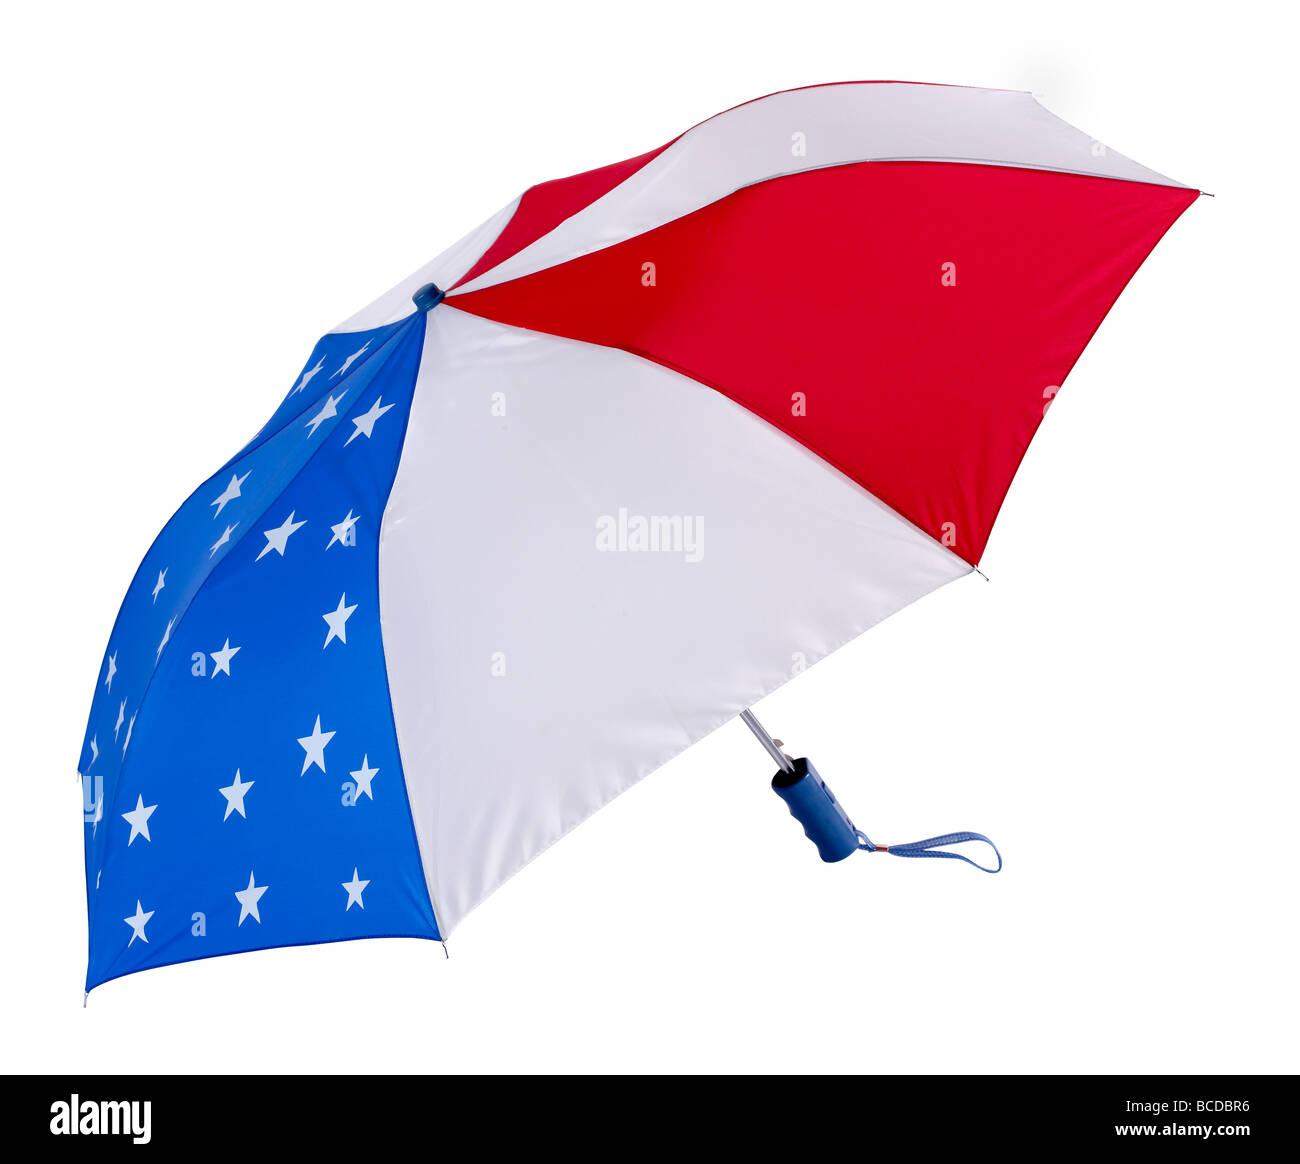 Patriotic Umbrella flag July 4th - Stock Image